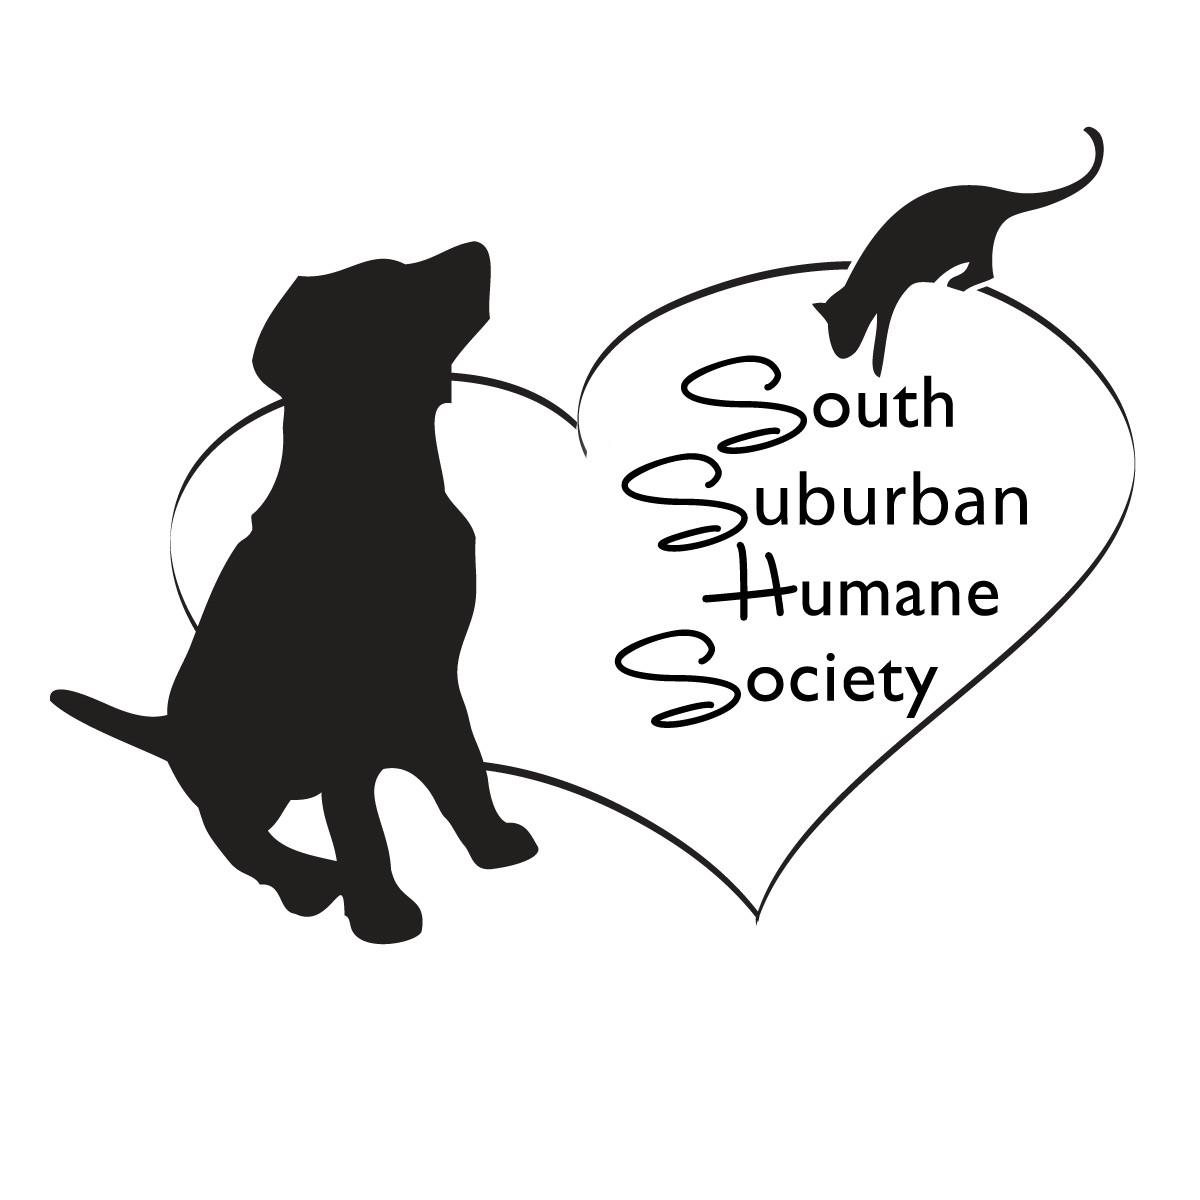 Genuine South Suburban Humane Society Donate Helping Hands Humane Society Kansas City Helping Hands Humane Society Adoptable Pets bark post Helping Hands Humane Society